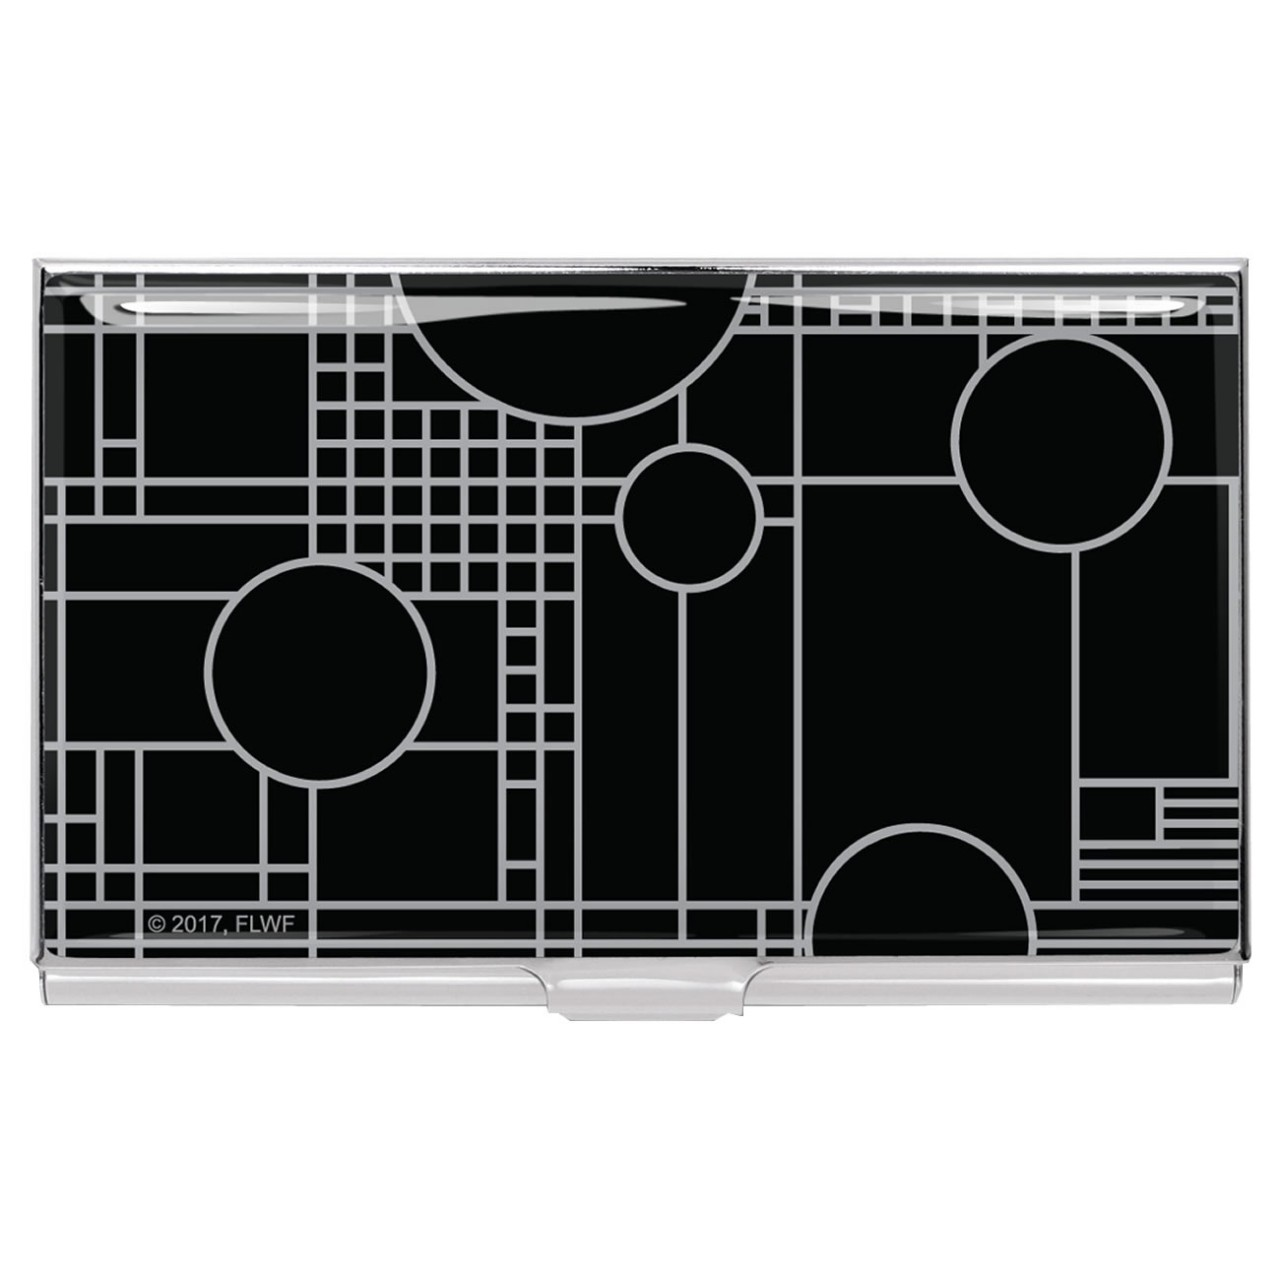 ACME 'PLAYHOUSE BLACK' Frank Lloyd Wright Card Case